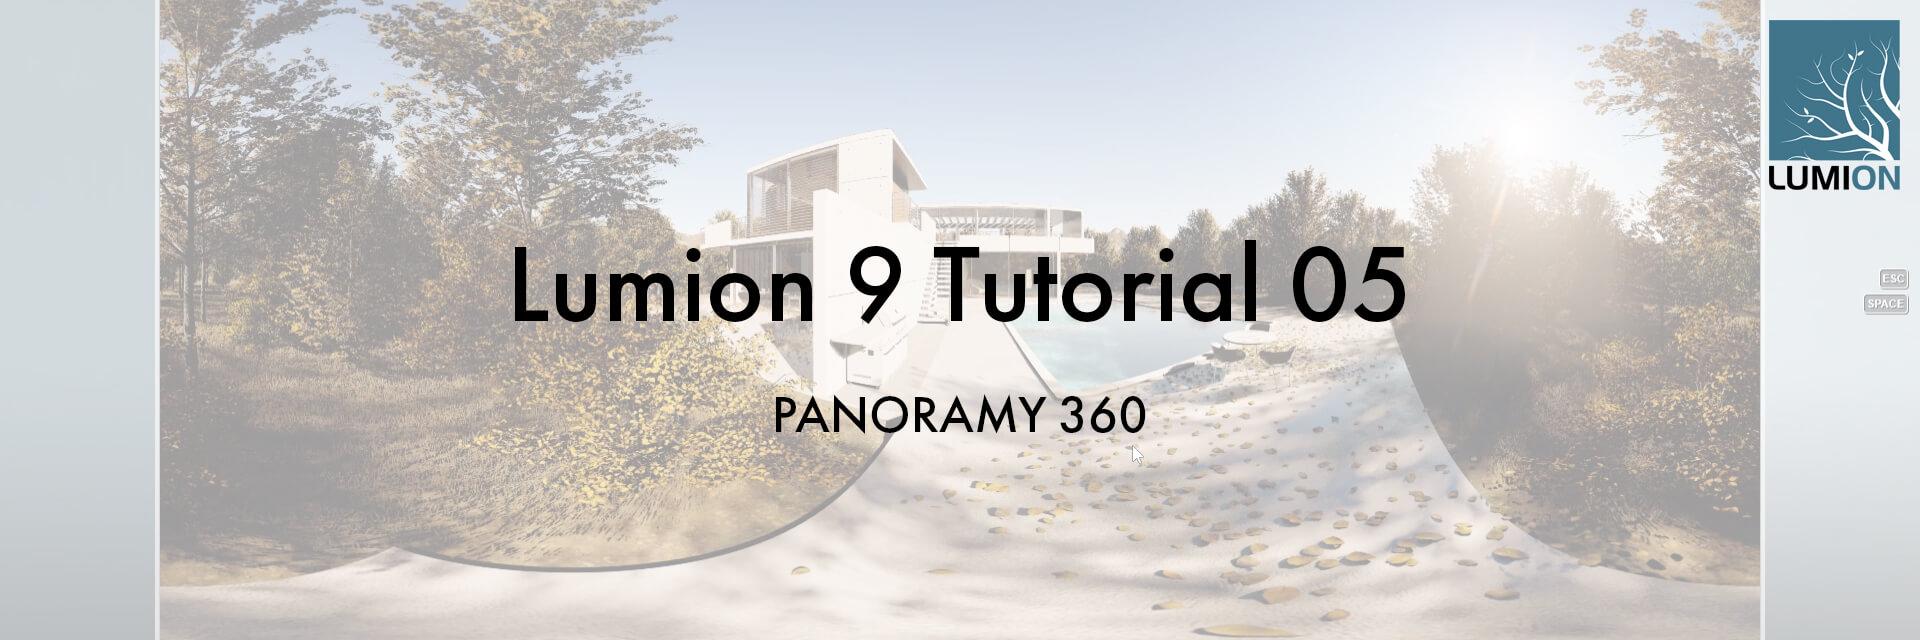 T05 ST - Lumion 9 Tutorial 05 PANORAMY 360